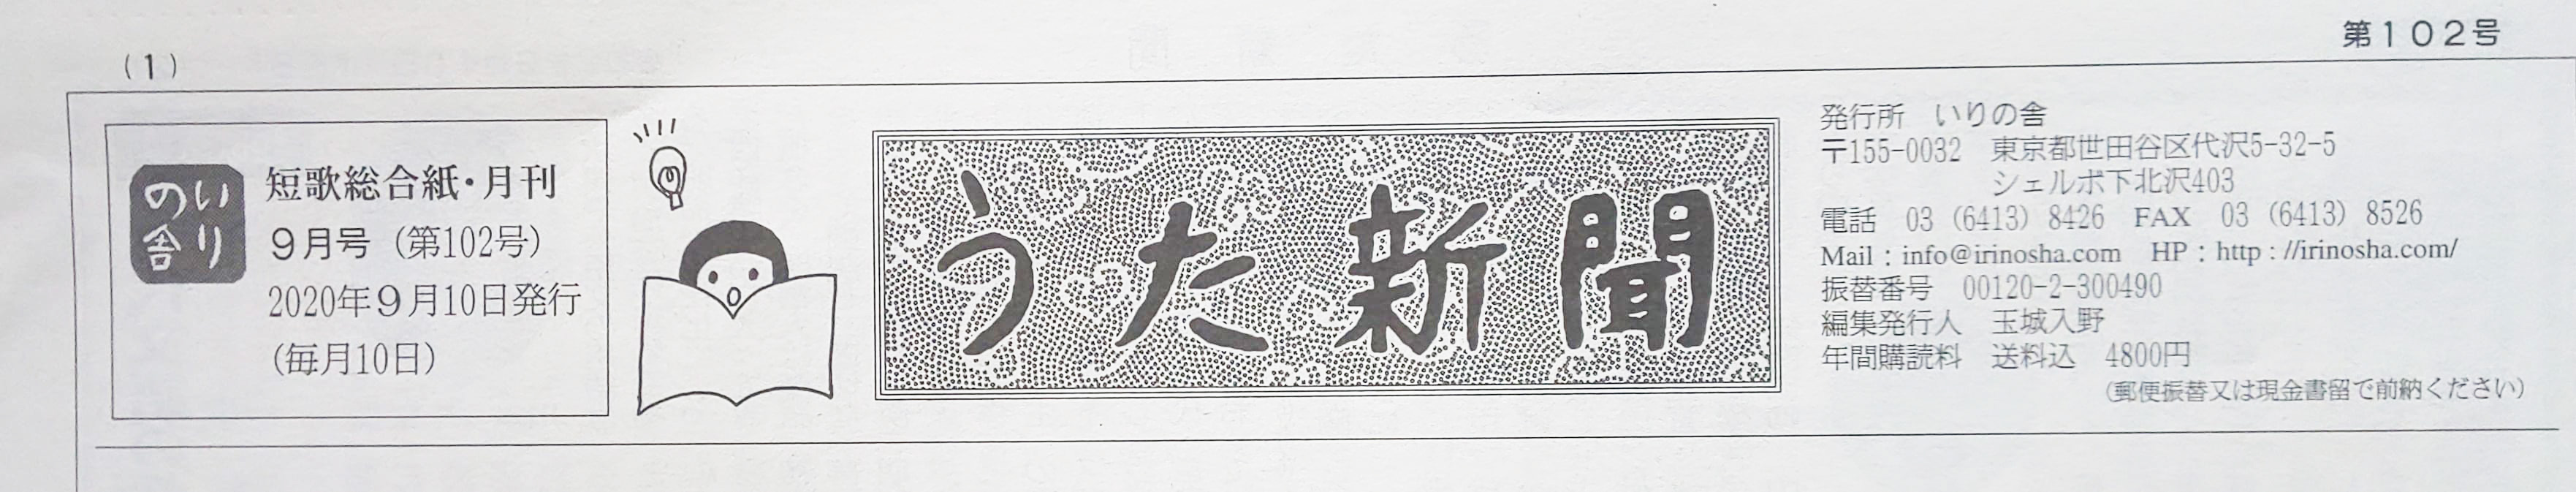 20200907_UtaShinbun_01.jpg